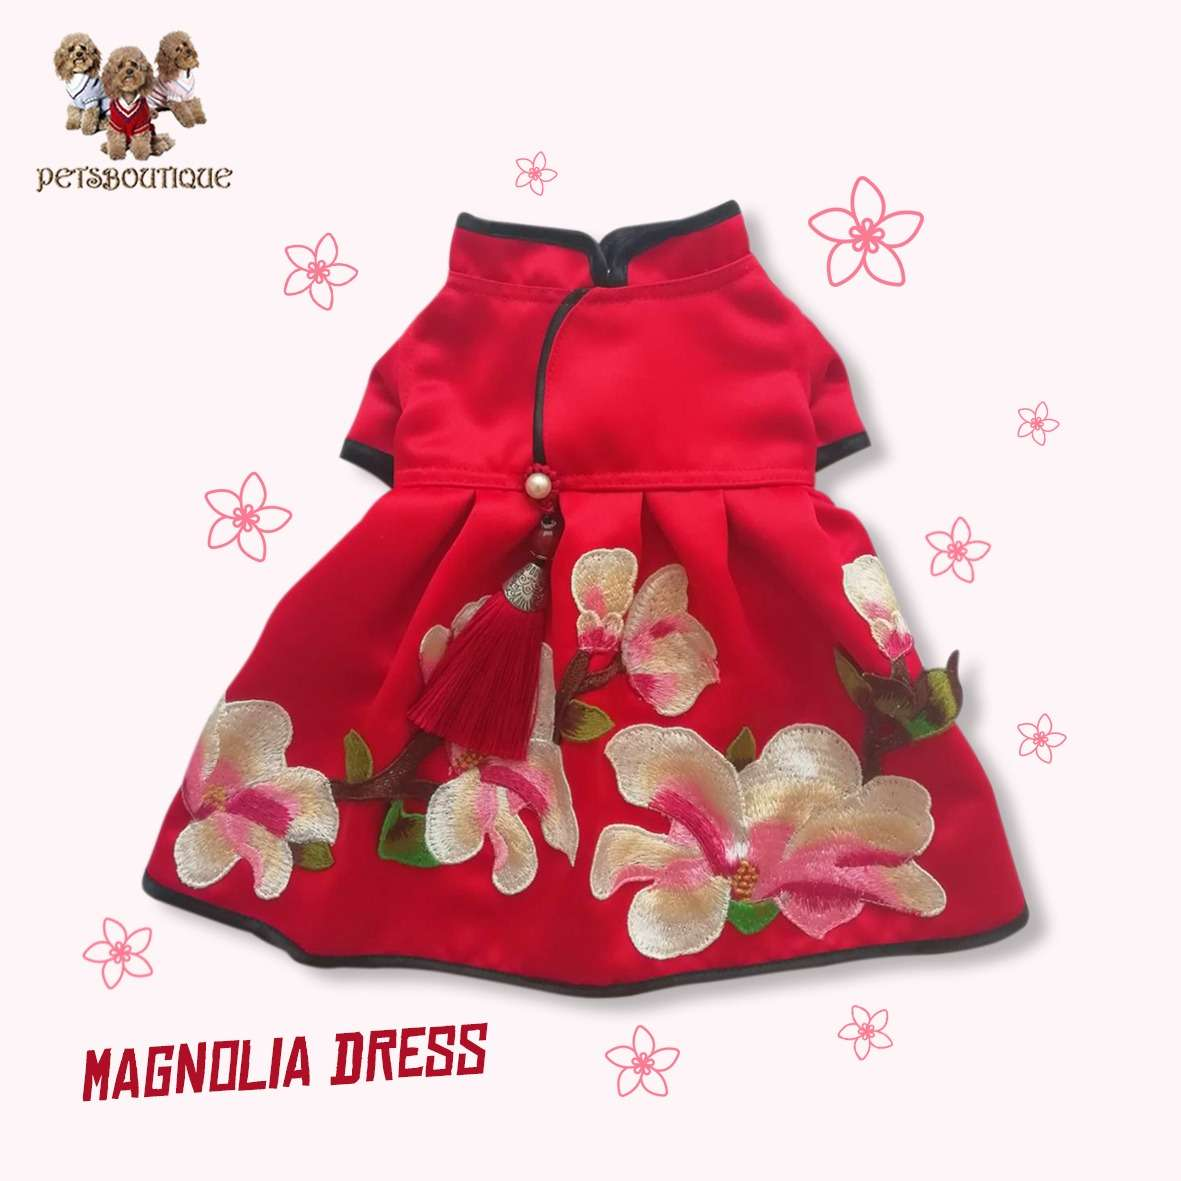 Petza - Chinese New Year Oriental - Magnolia Dress Photo